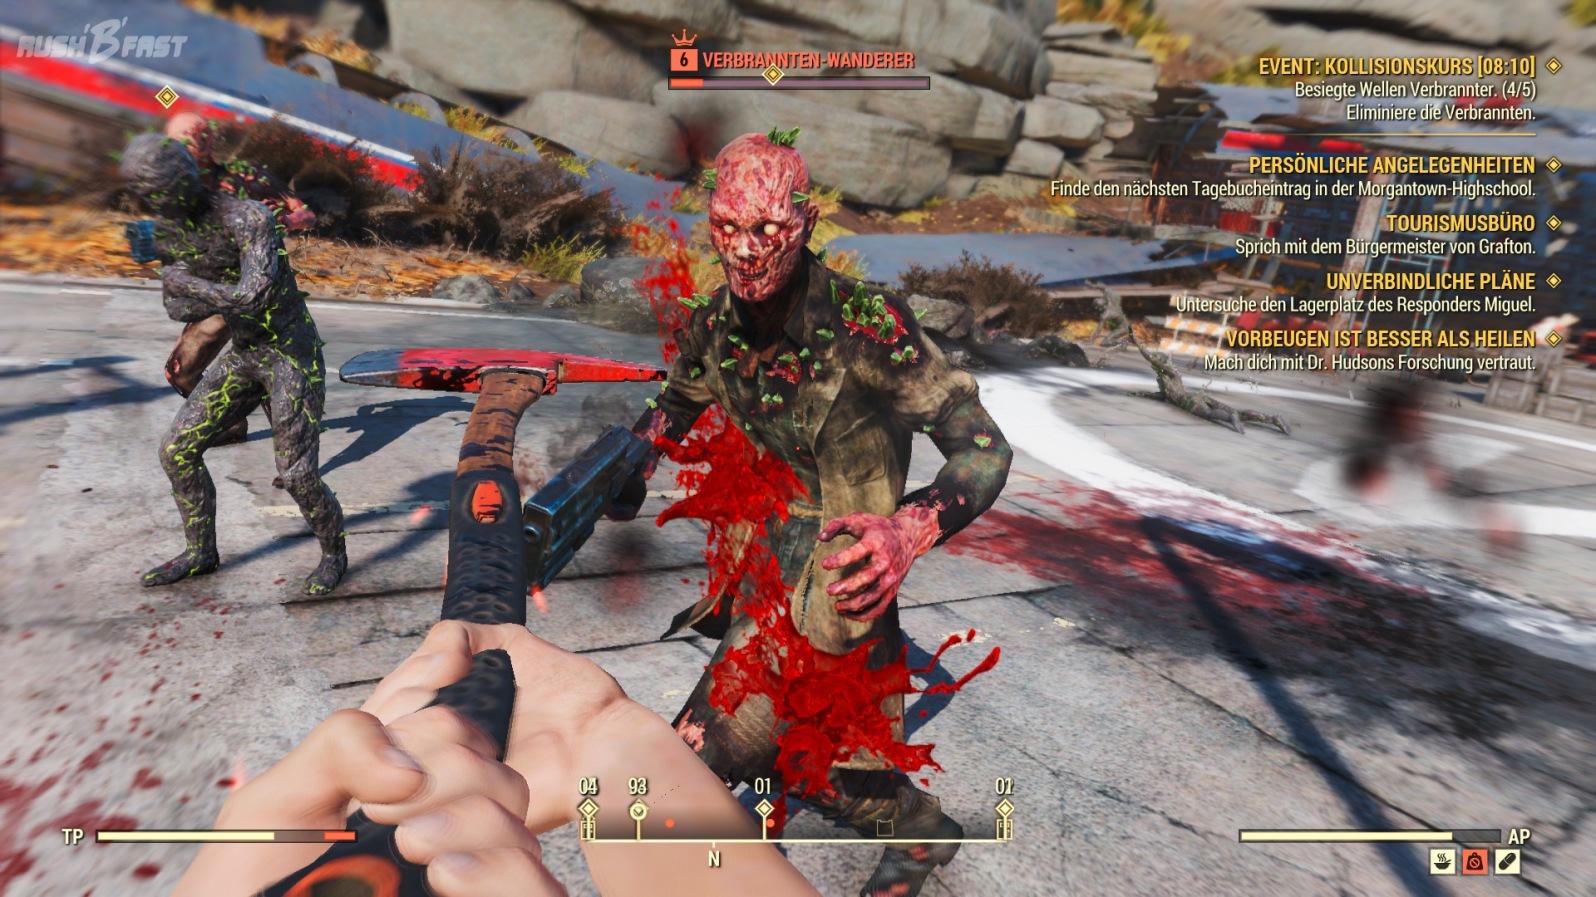 Fallout 76 - Event: Kollisionskurs - Gegner: Verbrannter-Wanderer (Elite)